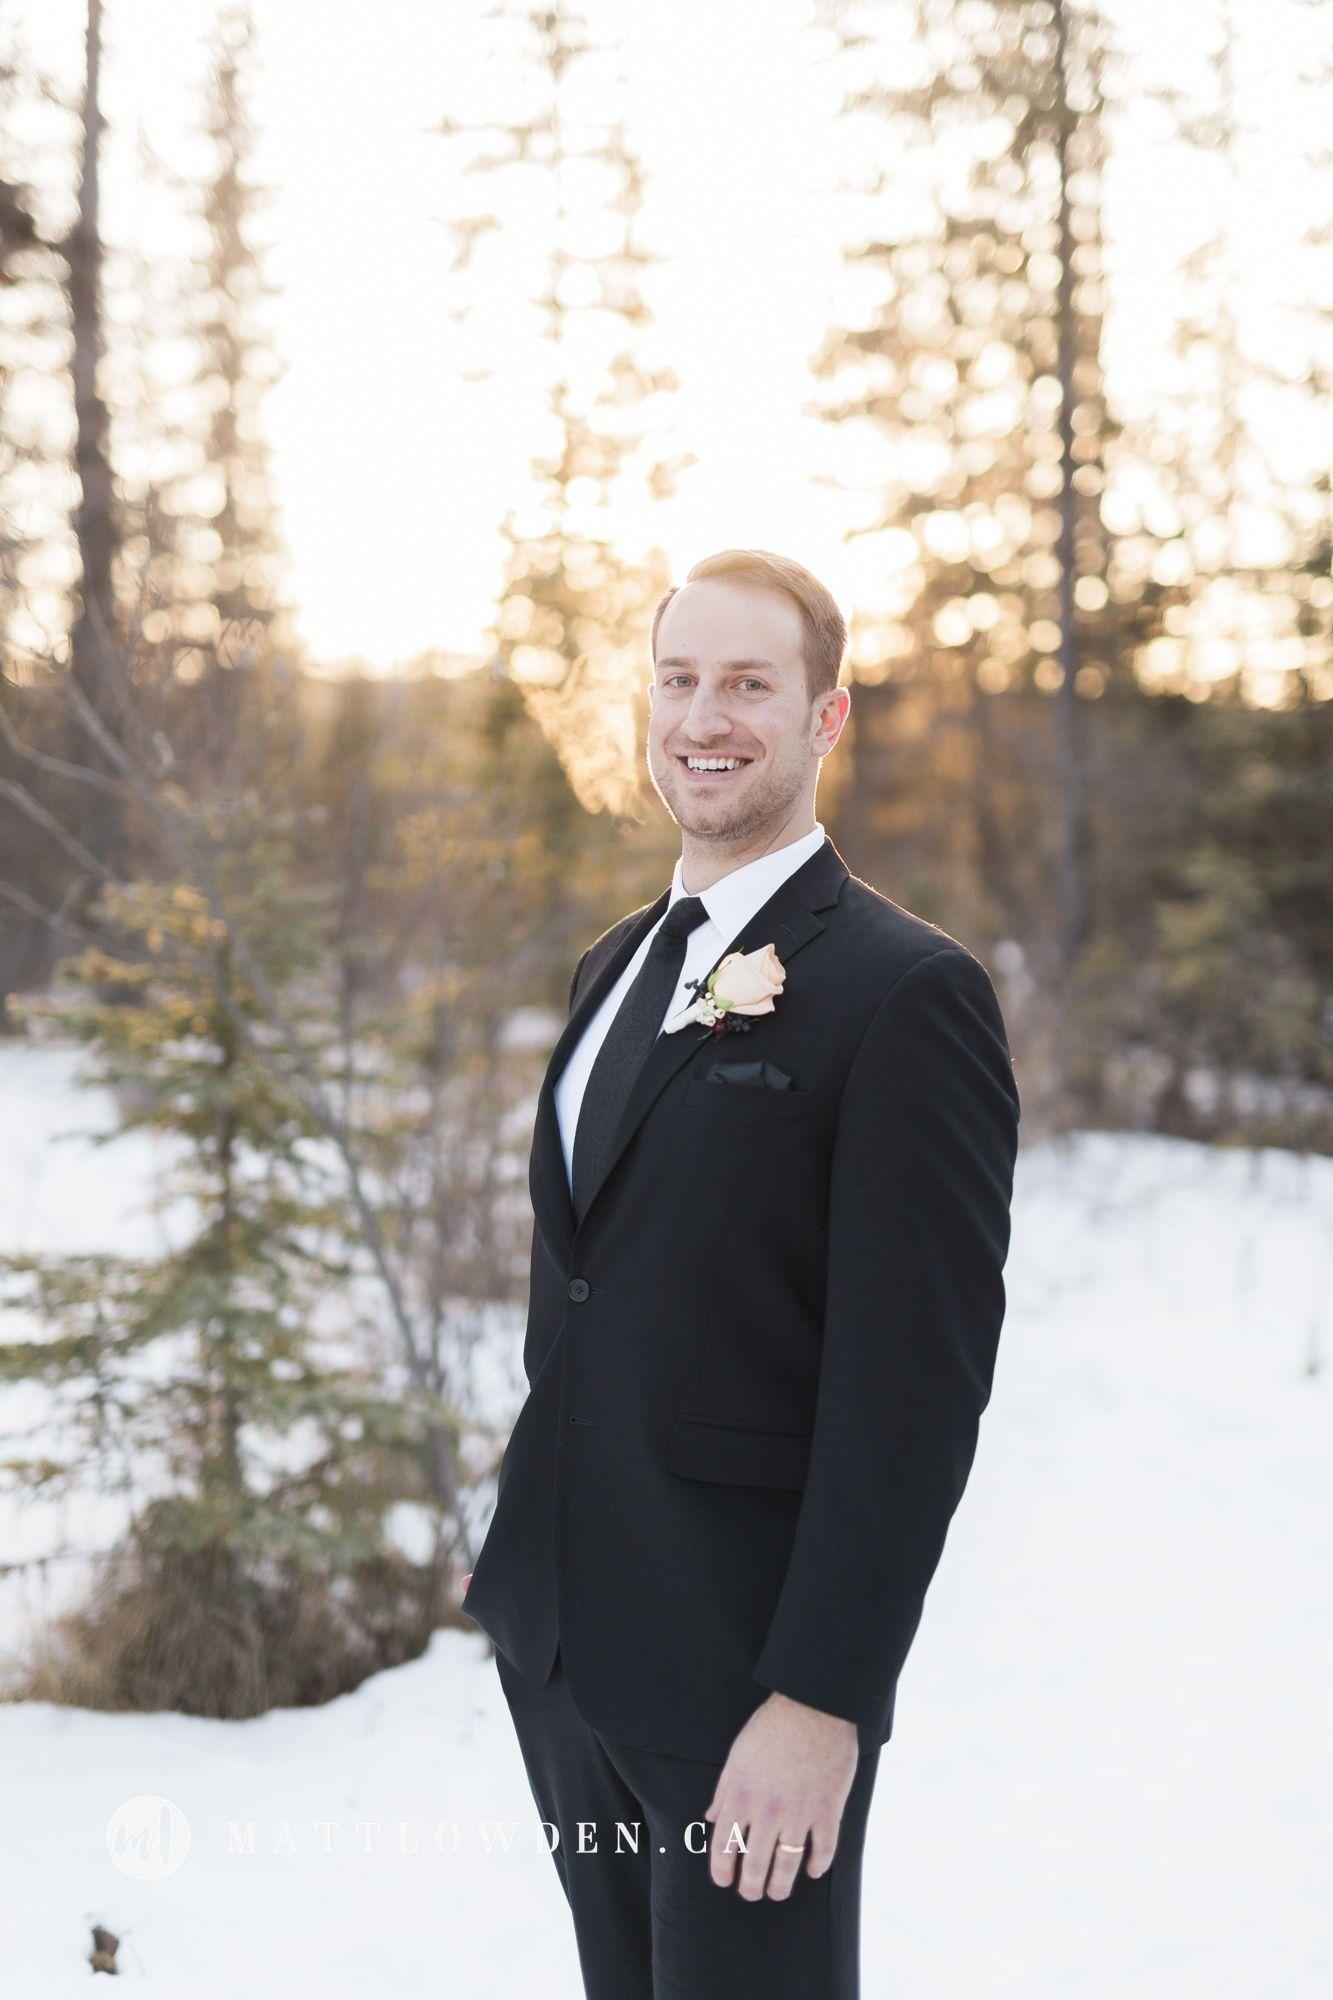 3a00a47c8eef intimate, groom, wedding, elopement, engagement, closeup, suit, tie, tux,  boutonniere, tie clip, bowtie, pocket square, watch, detail, sophisticated,  hair, ...